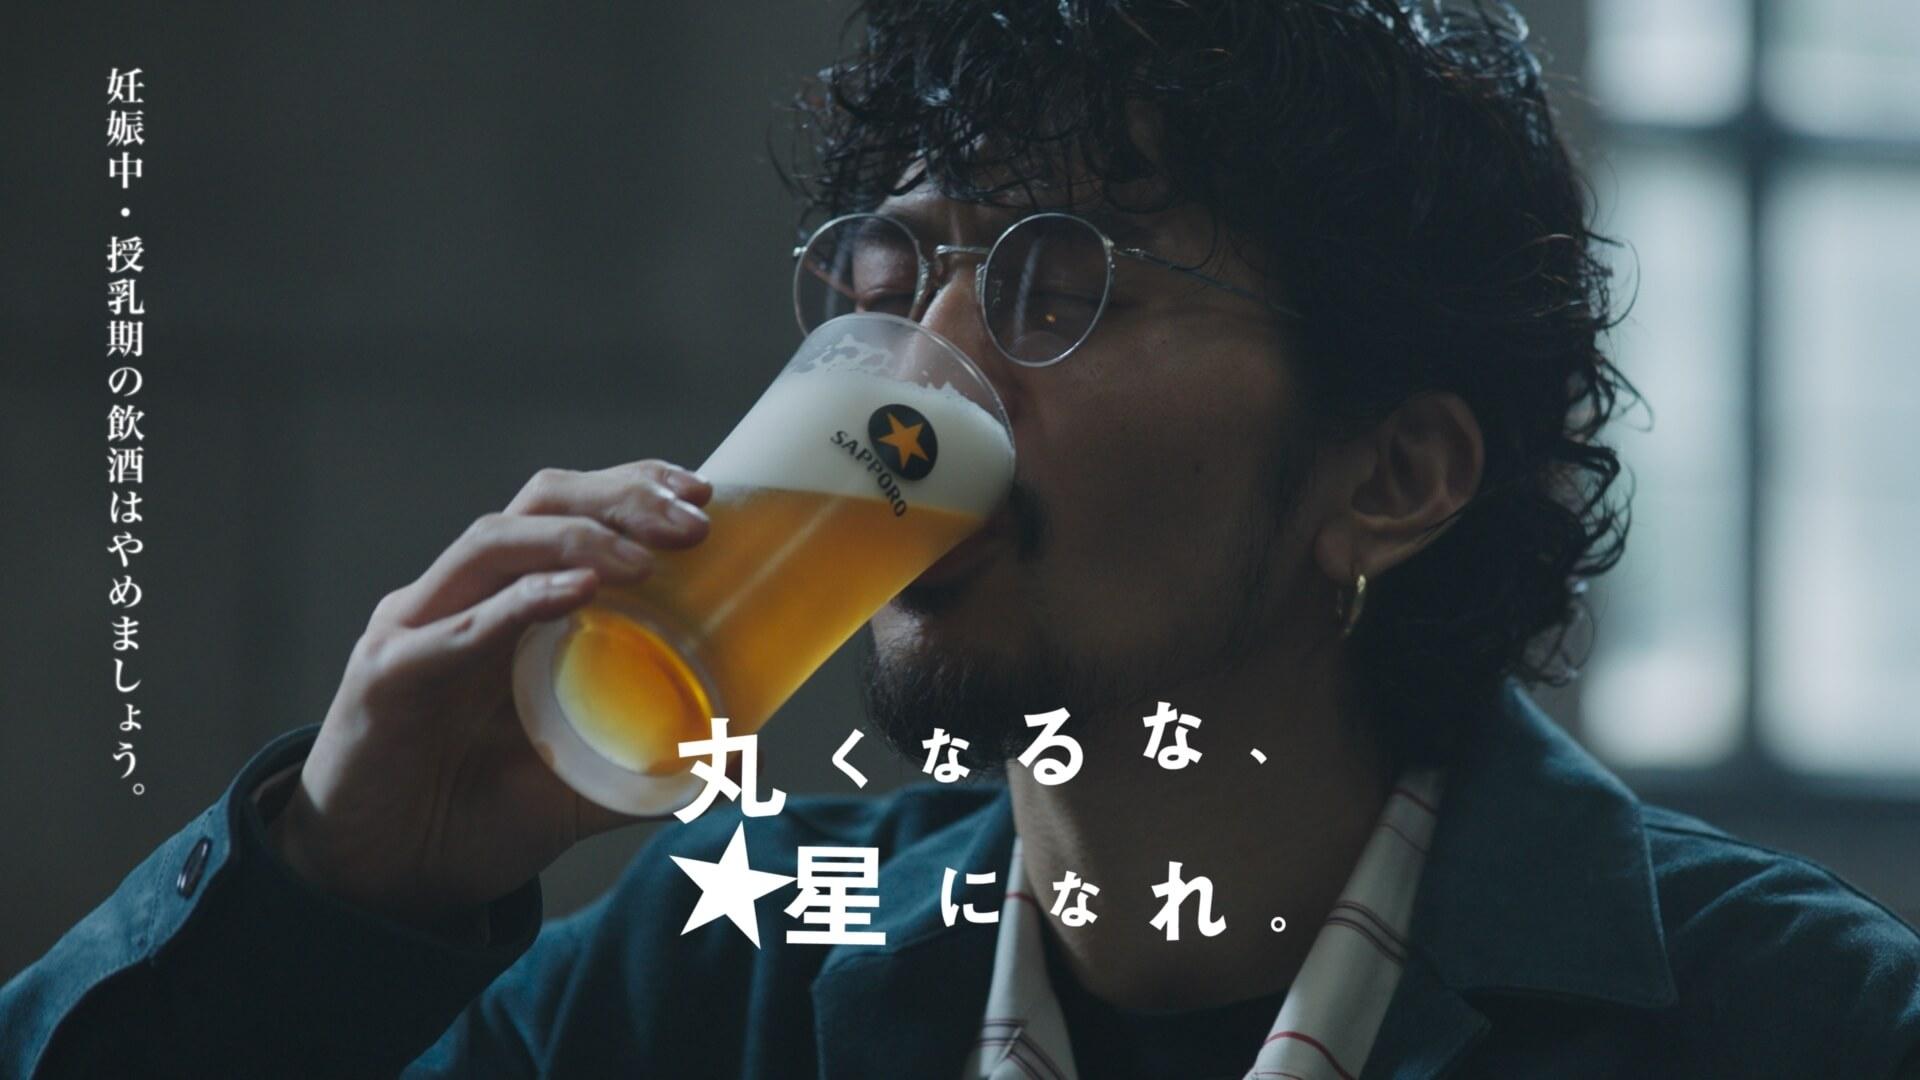 King Gnu常田大希が語る大人とは?サッポロ生ビール黒ラベルのCM「大人エレベーター」に登場! gourmet200327_sapporo_tsuneda_13